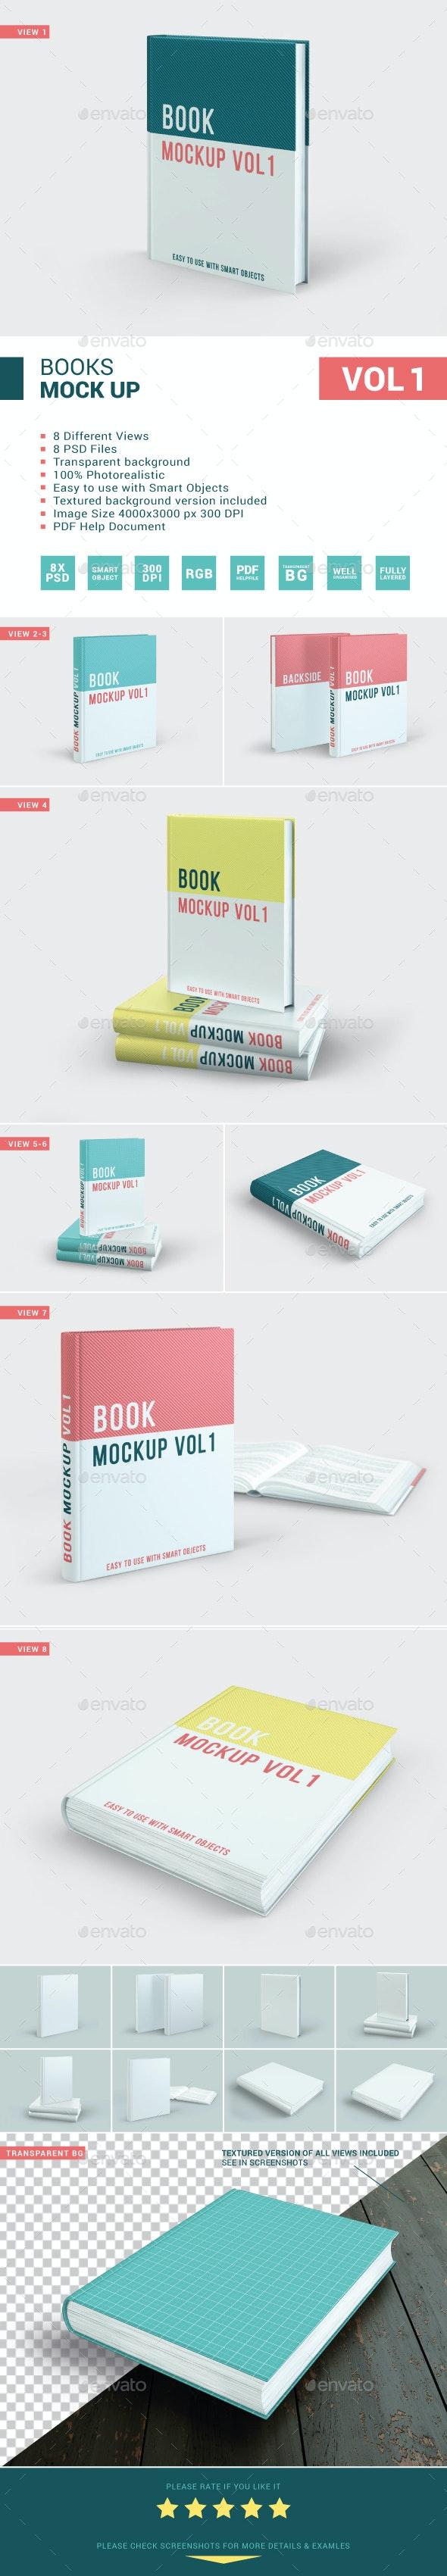 Books Mockup Vol 1 - Books Print